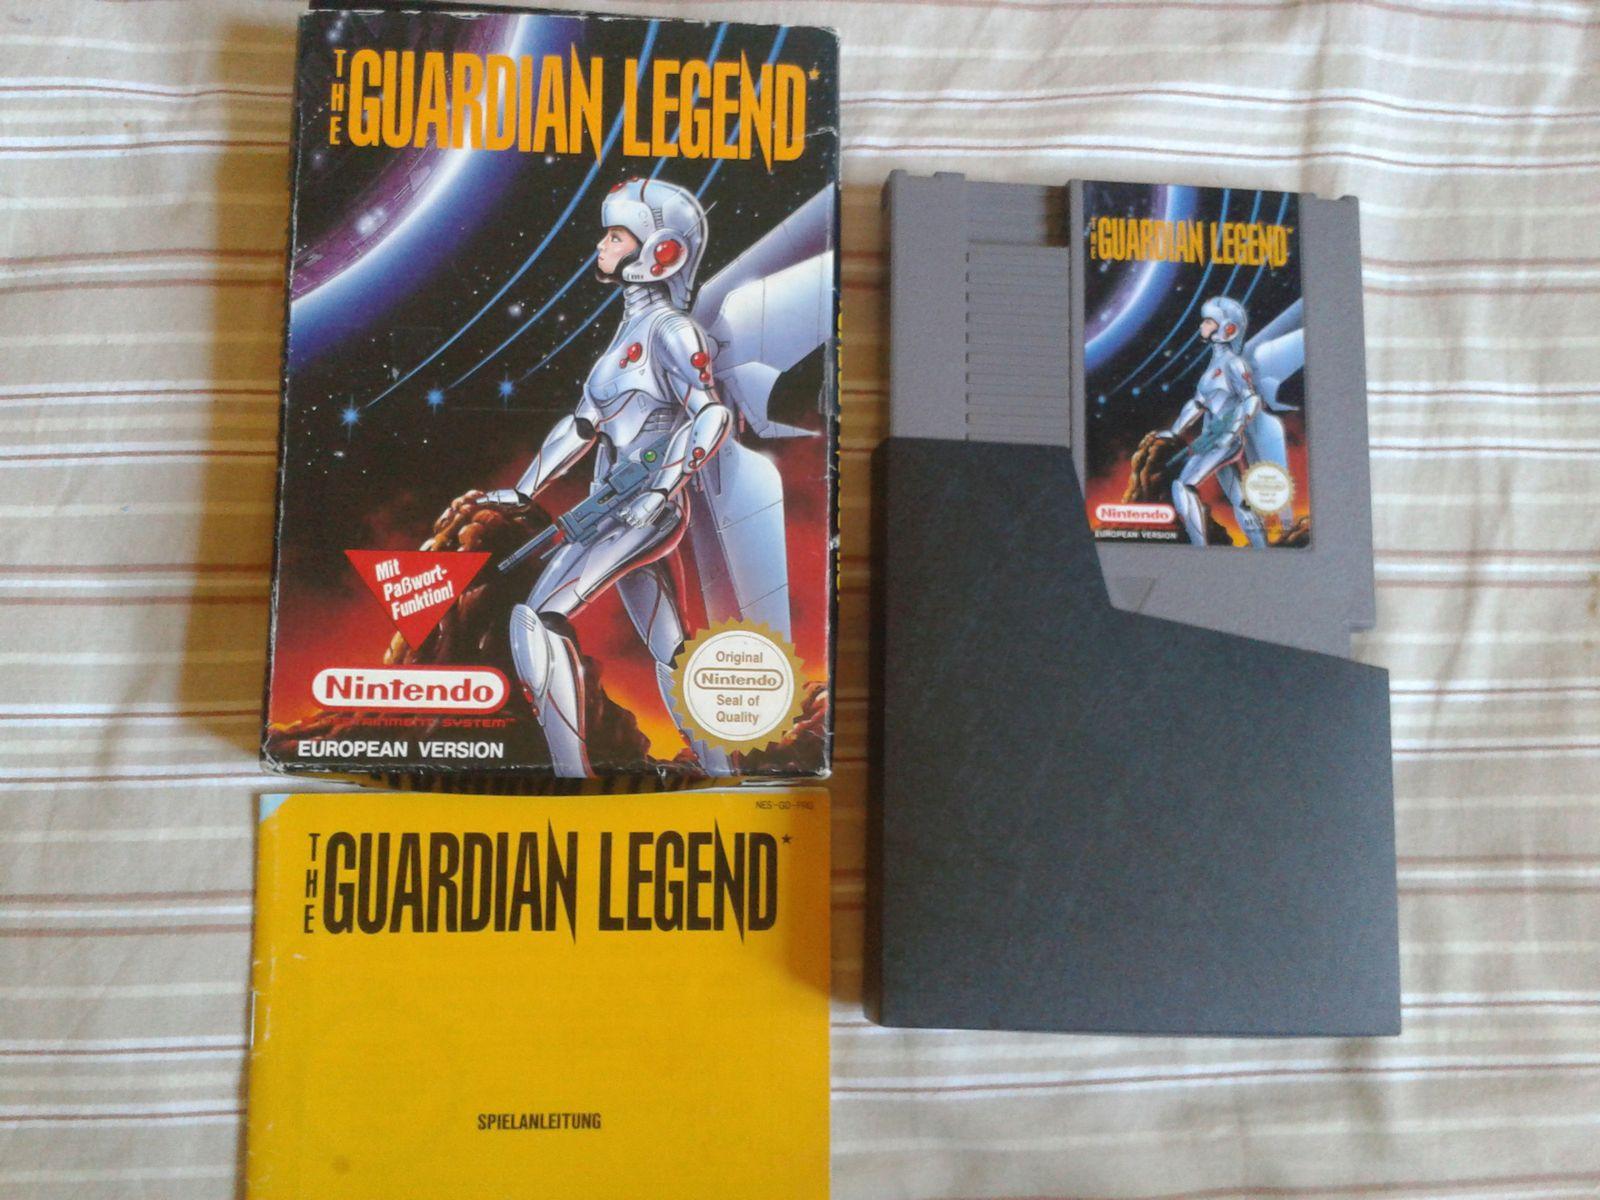 Guardian legend (European version)